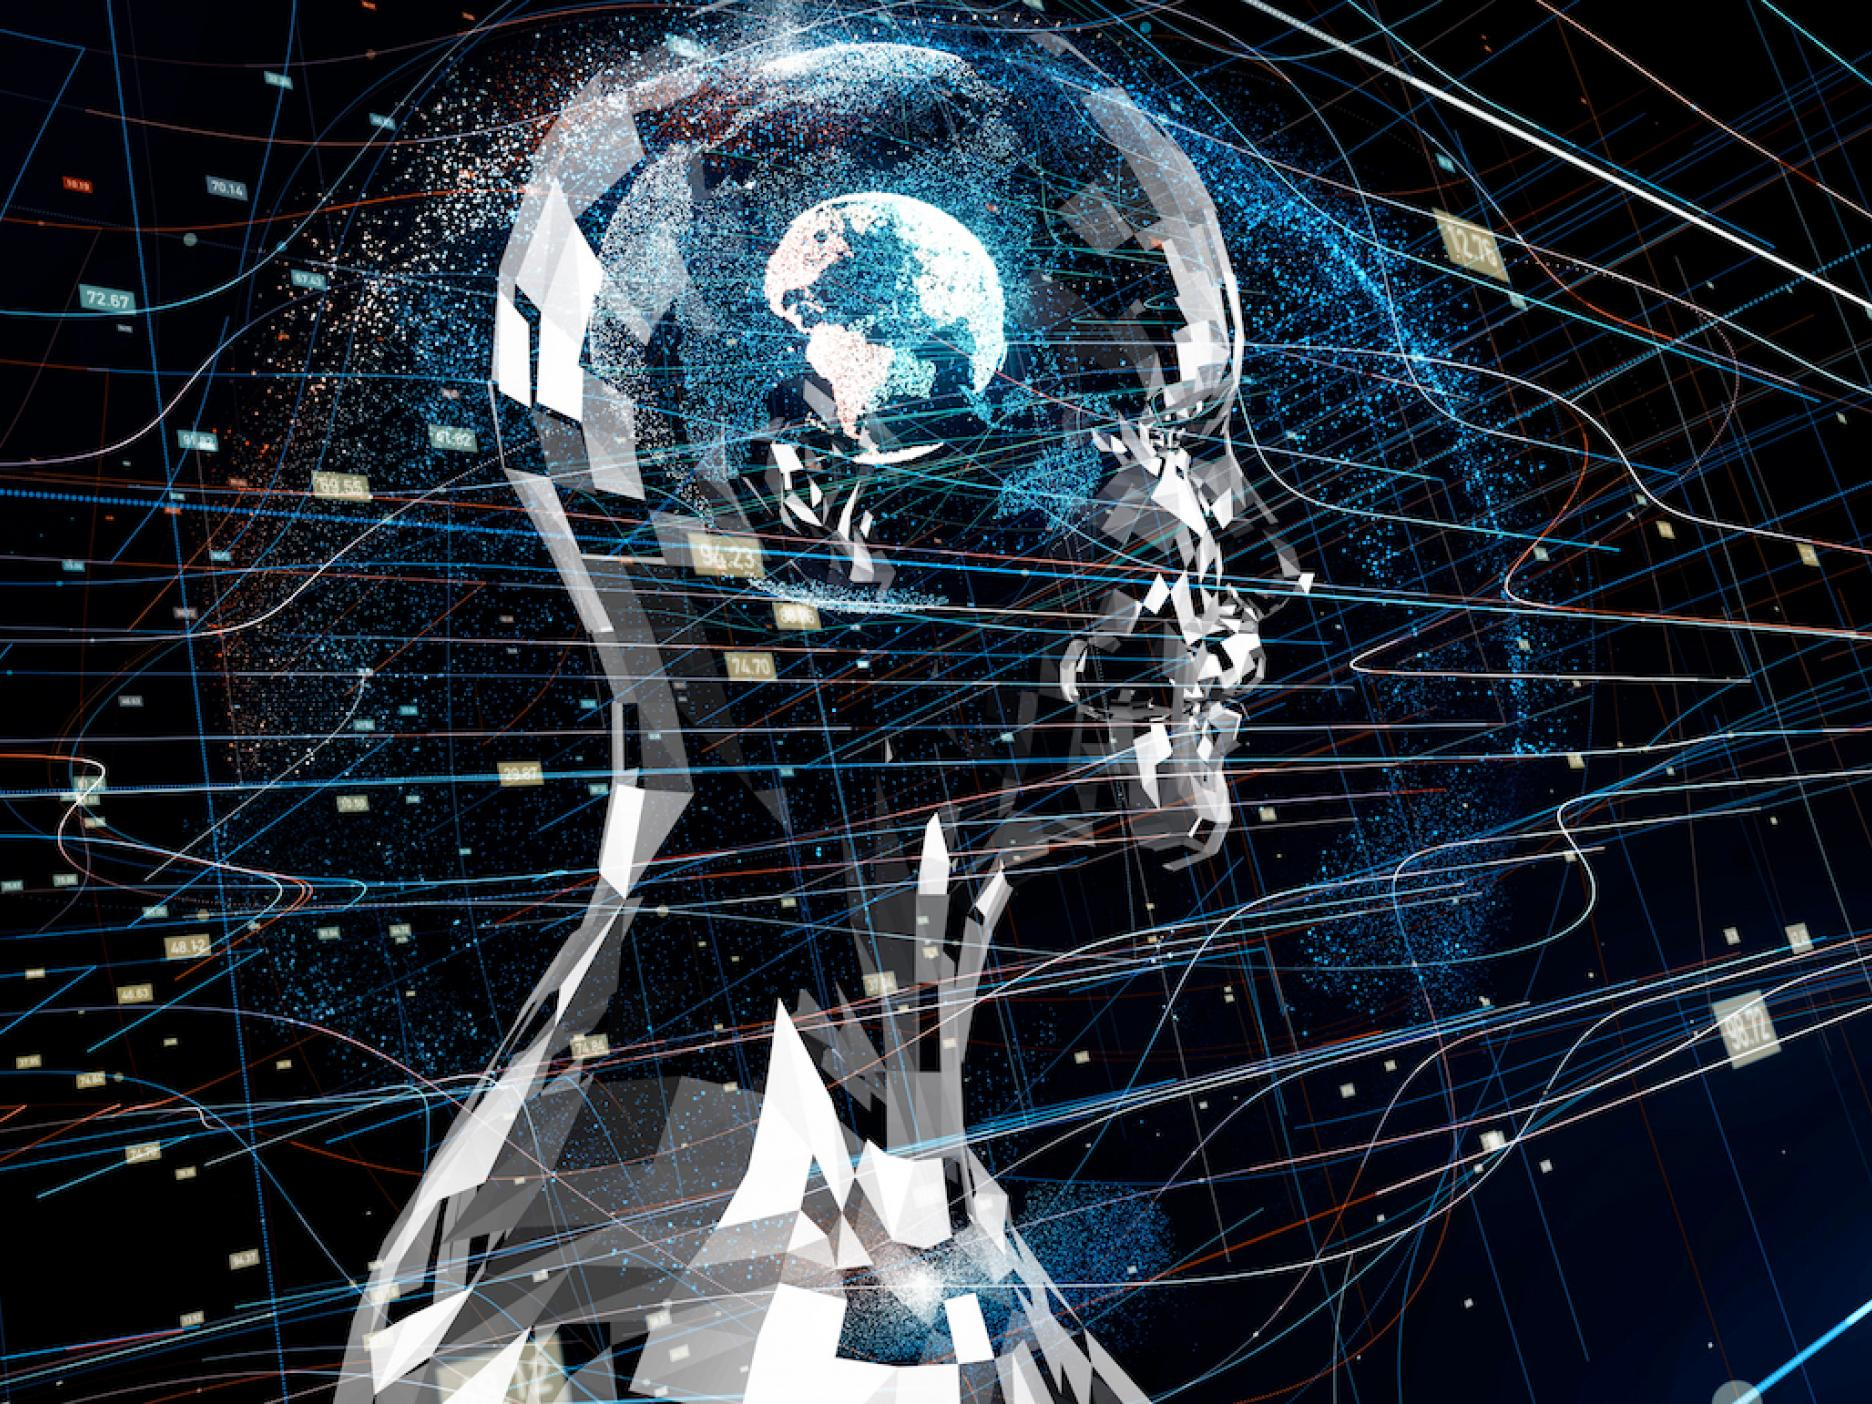 Data Science/AI/Robotics